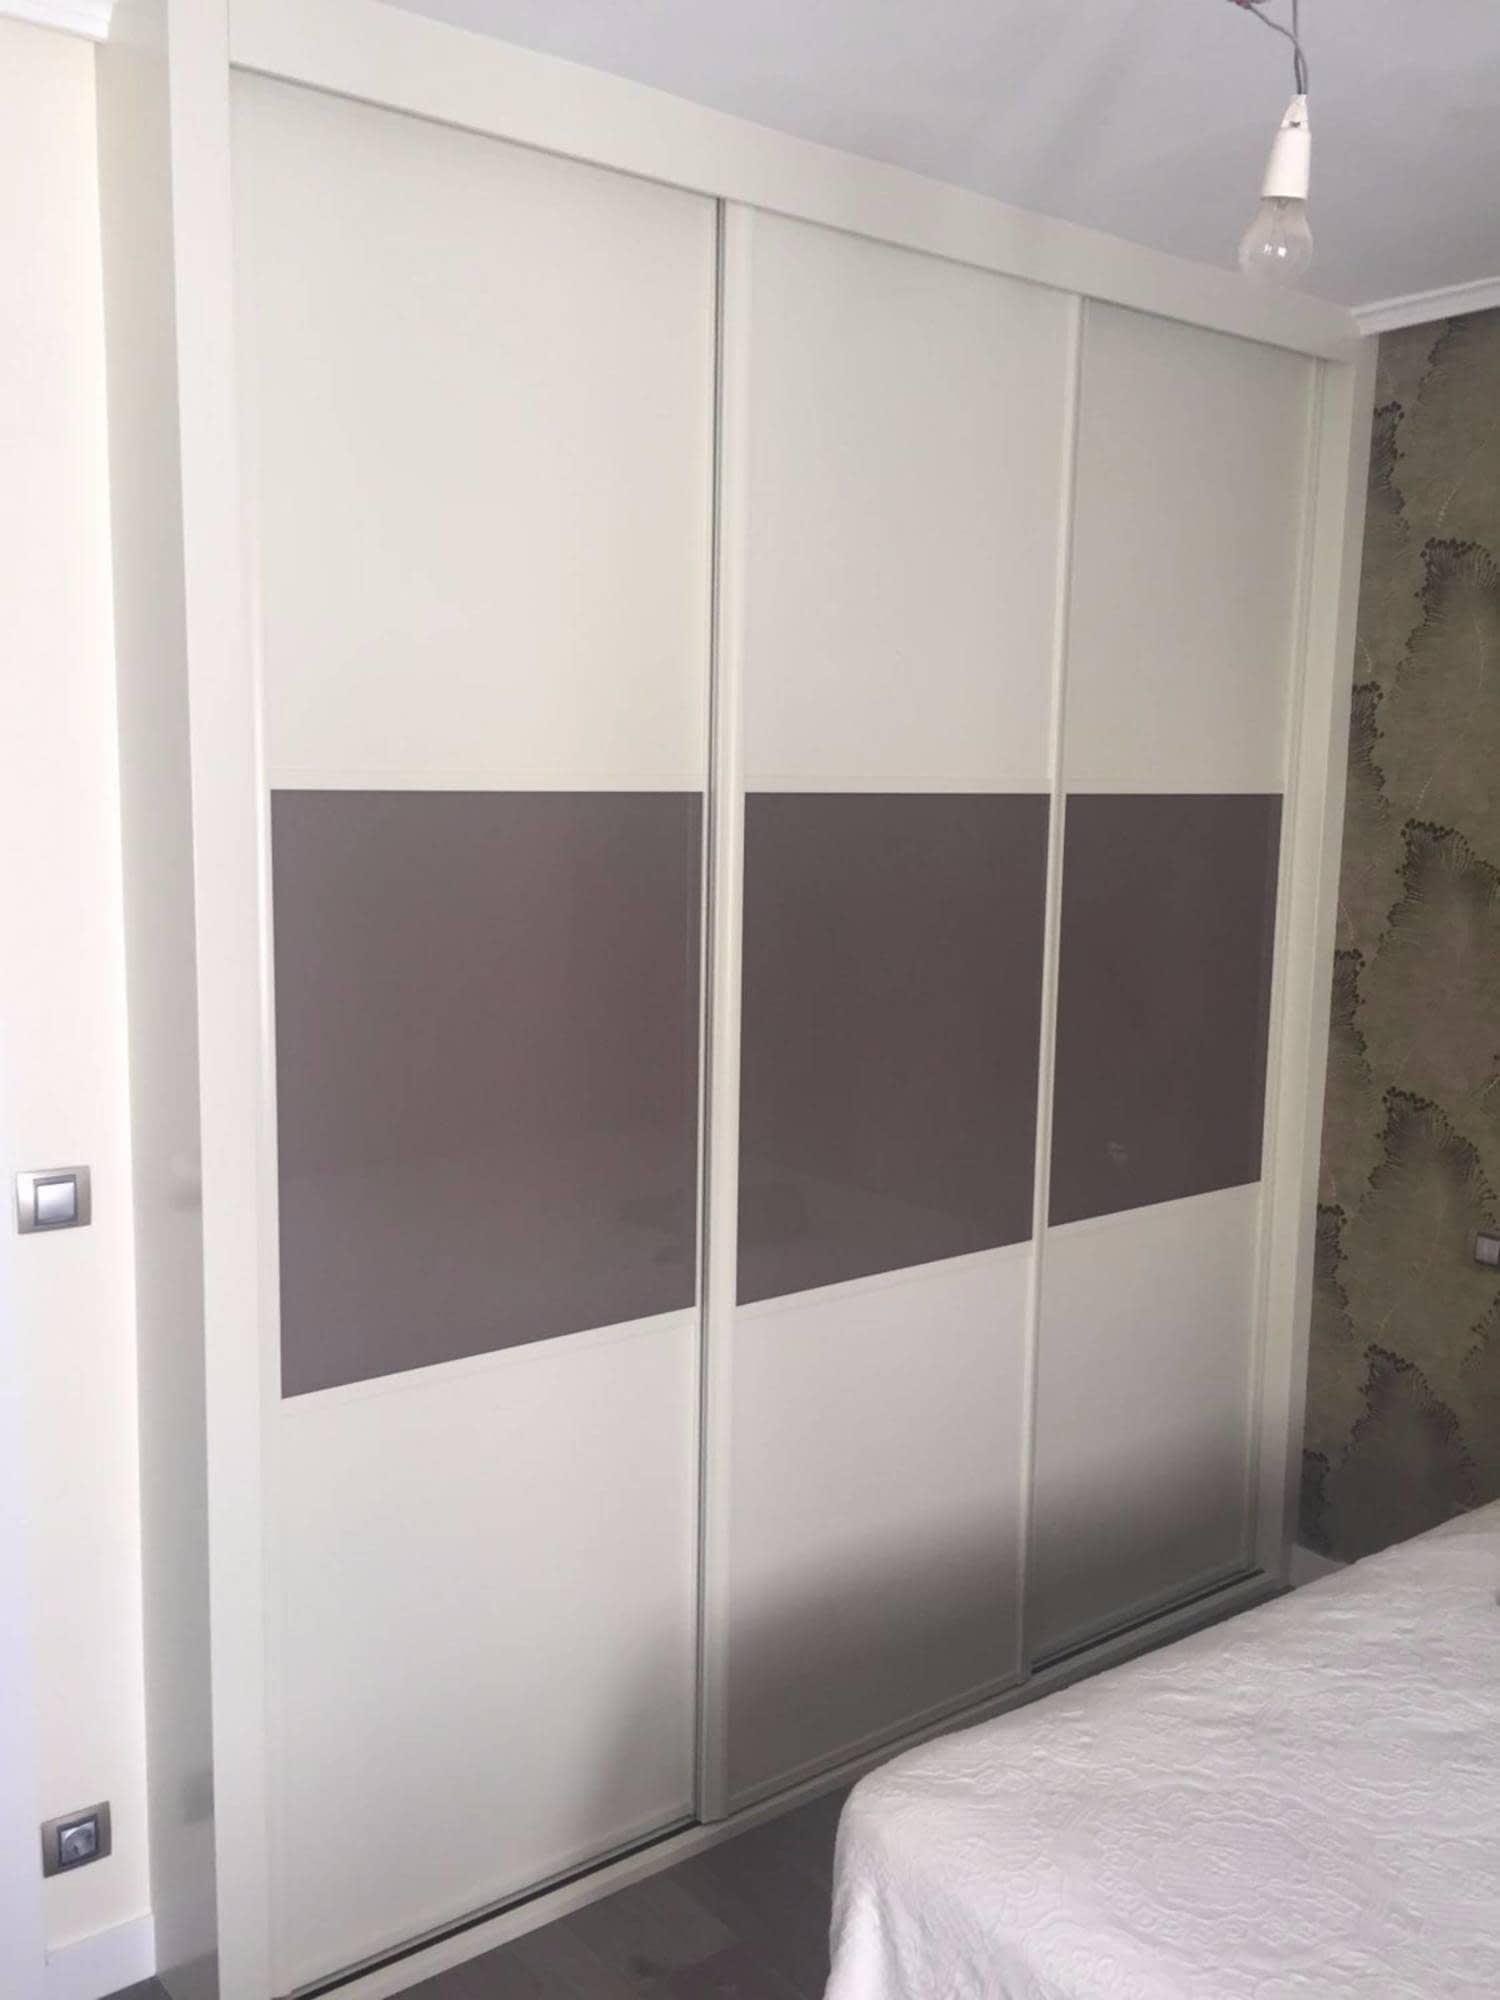 Puertas armarios empotrados blancos cheap beautiful - Armarios empotrados puertas ...